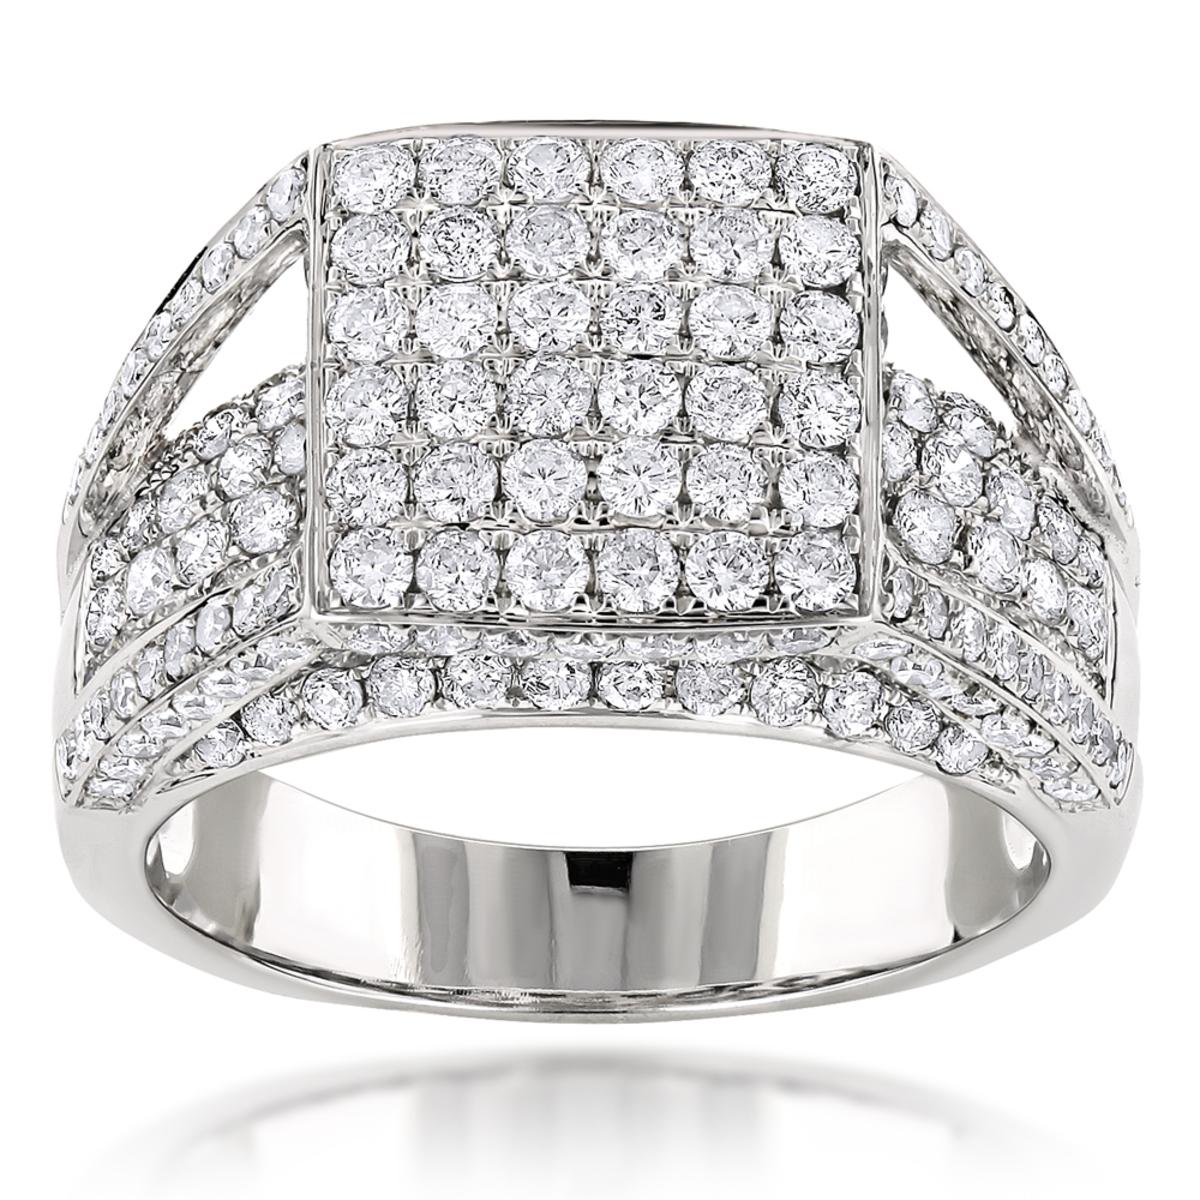 14K Designer Diamond Ring 2.79ct